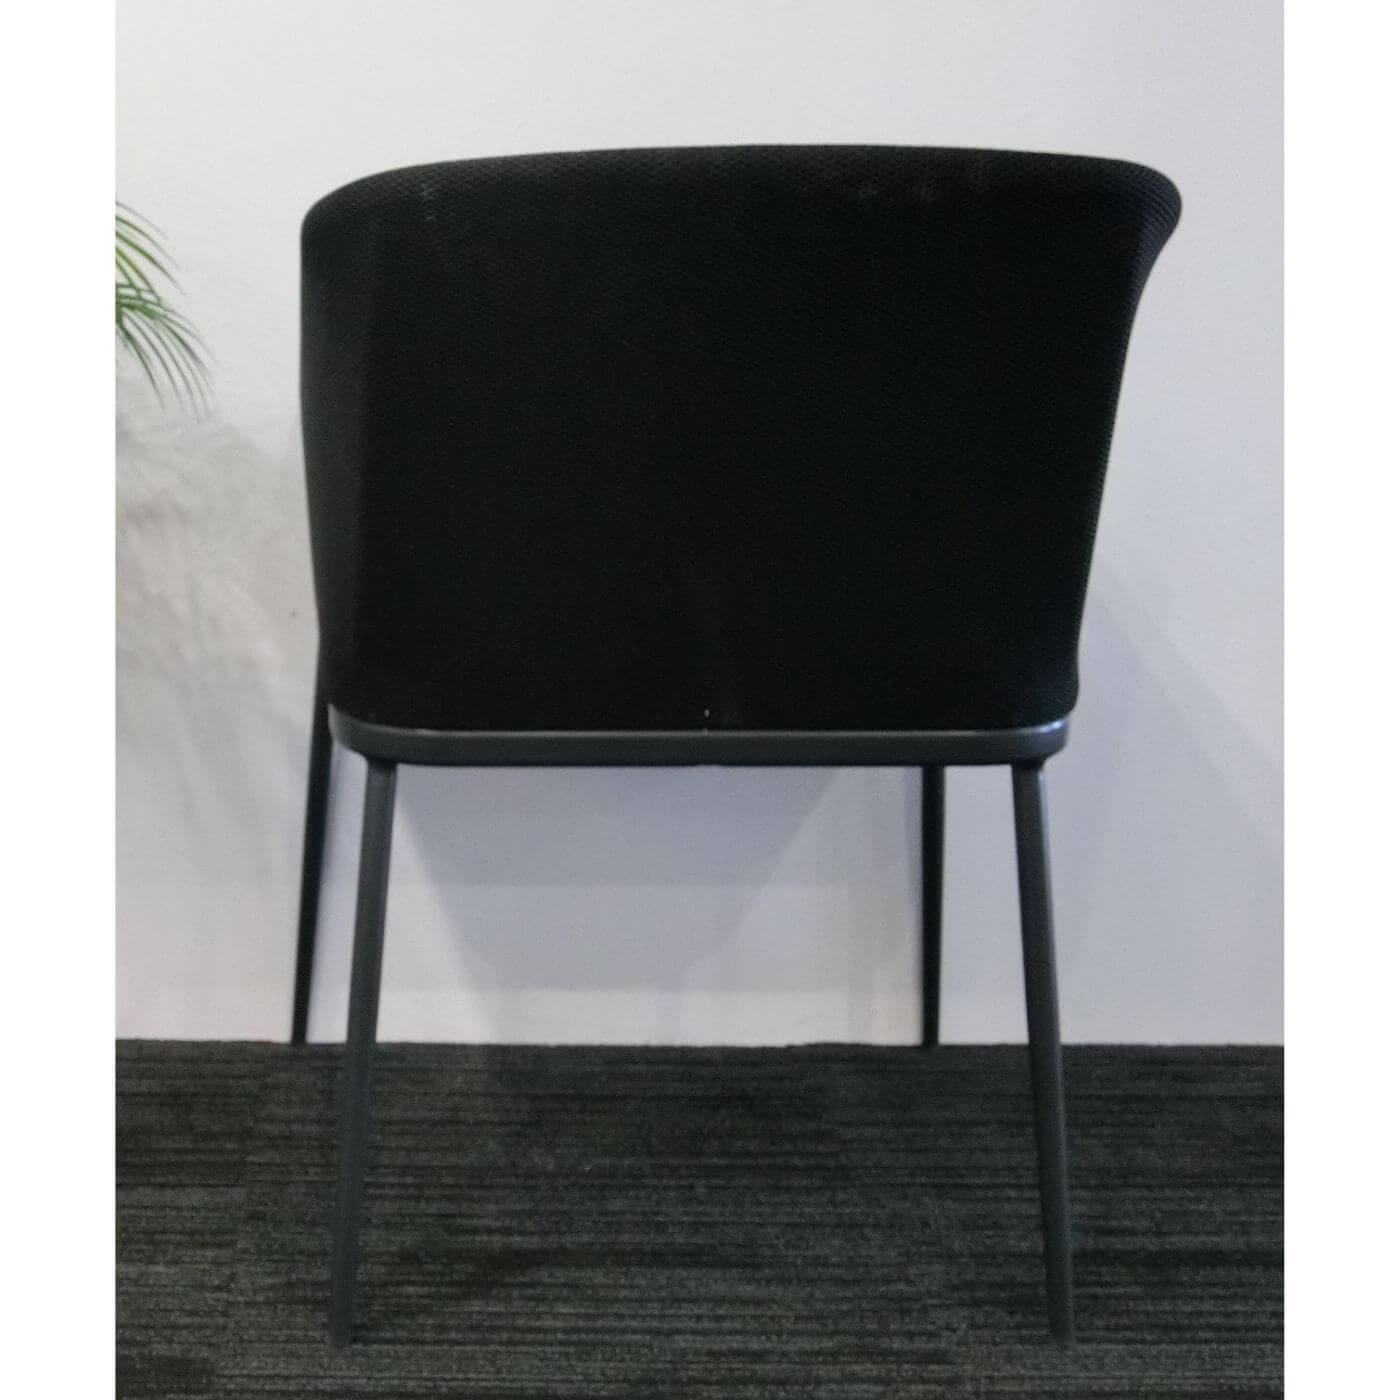 Studio Expormim Senso outdoor chair